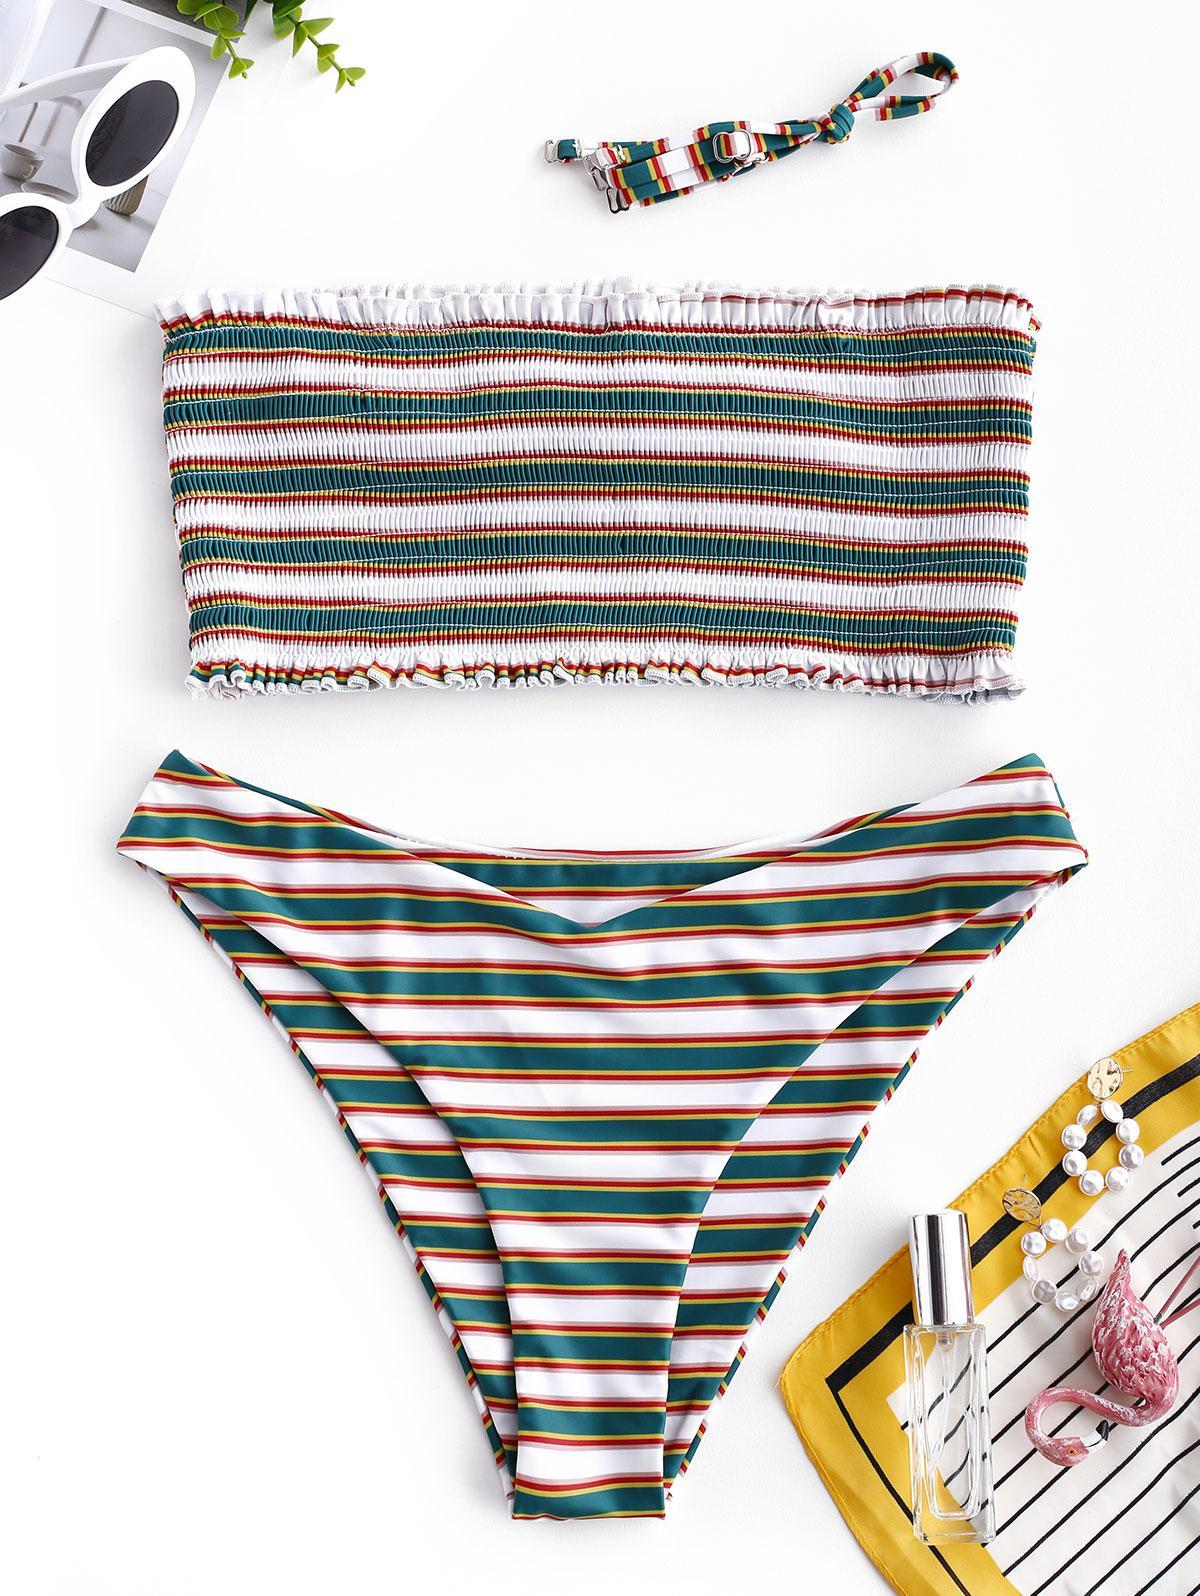 ZAFUL Striped Smocked Bandeau Bikini Set, Multi-a